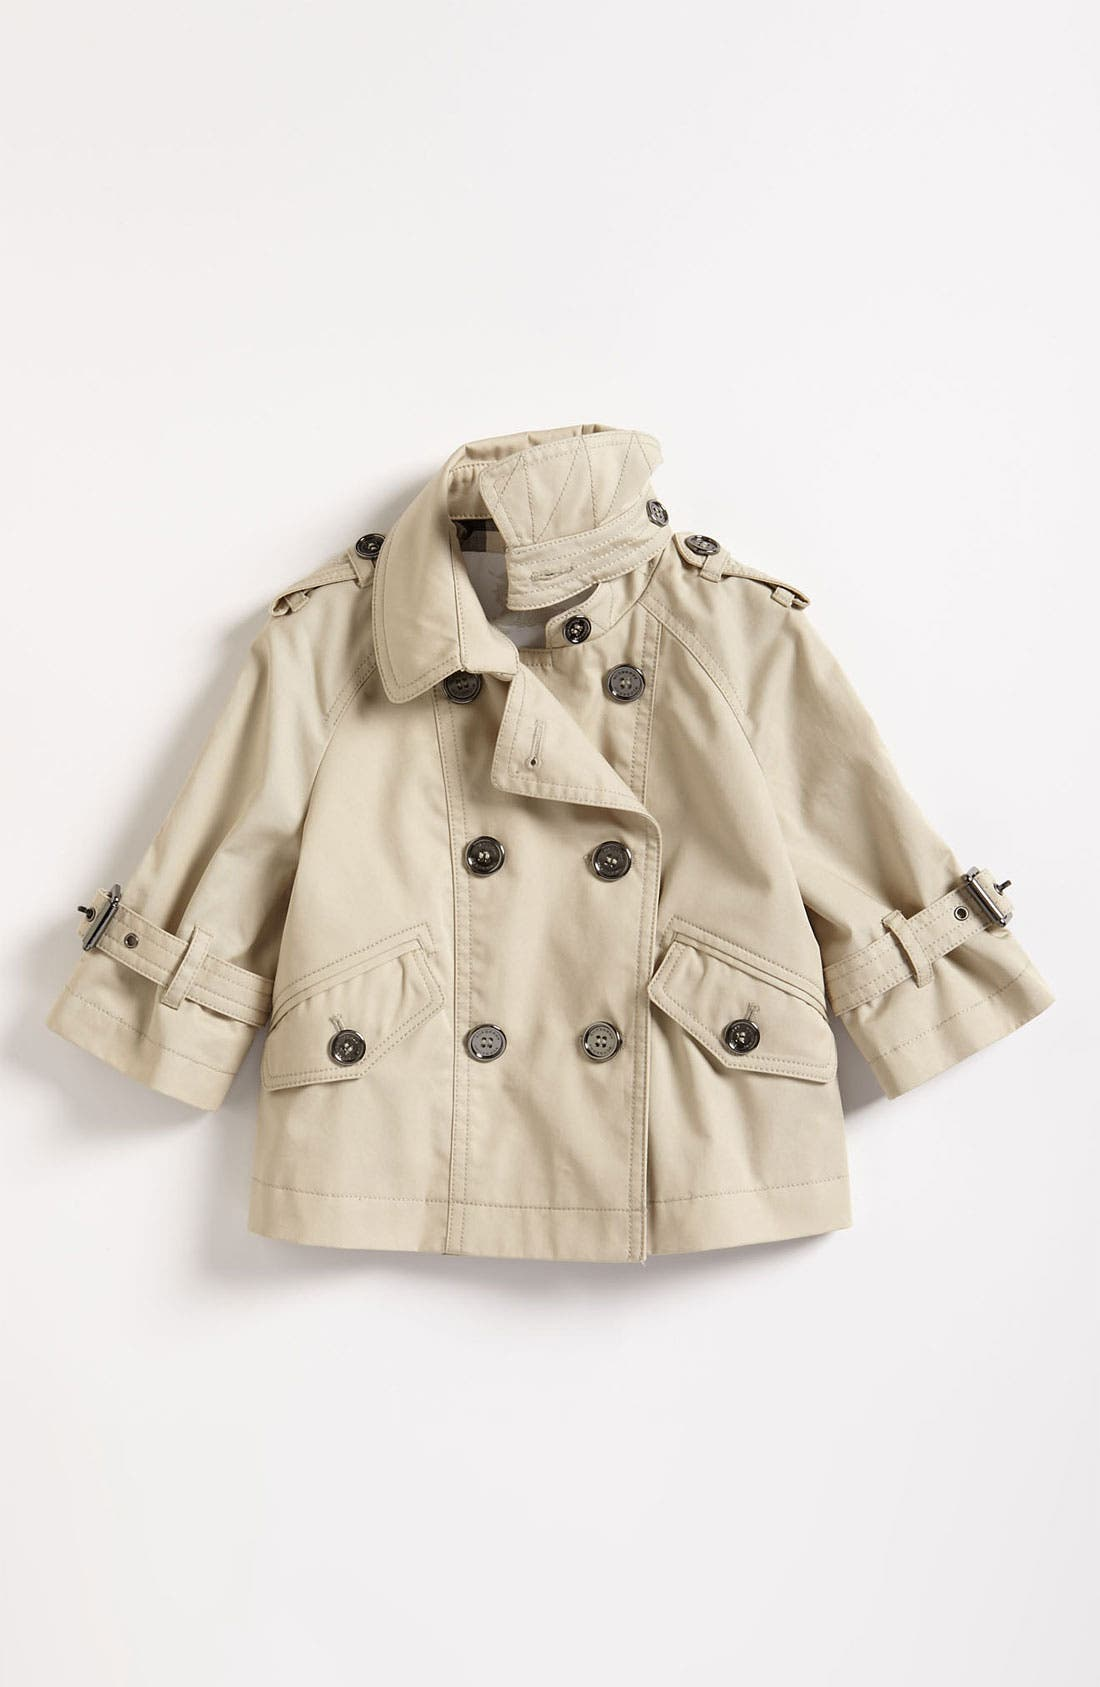 Main Image - Burberry Jacket (Toddler)